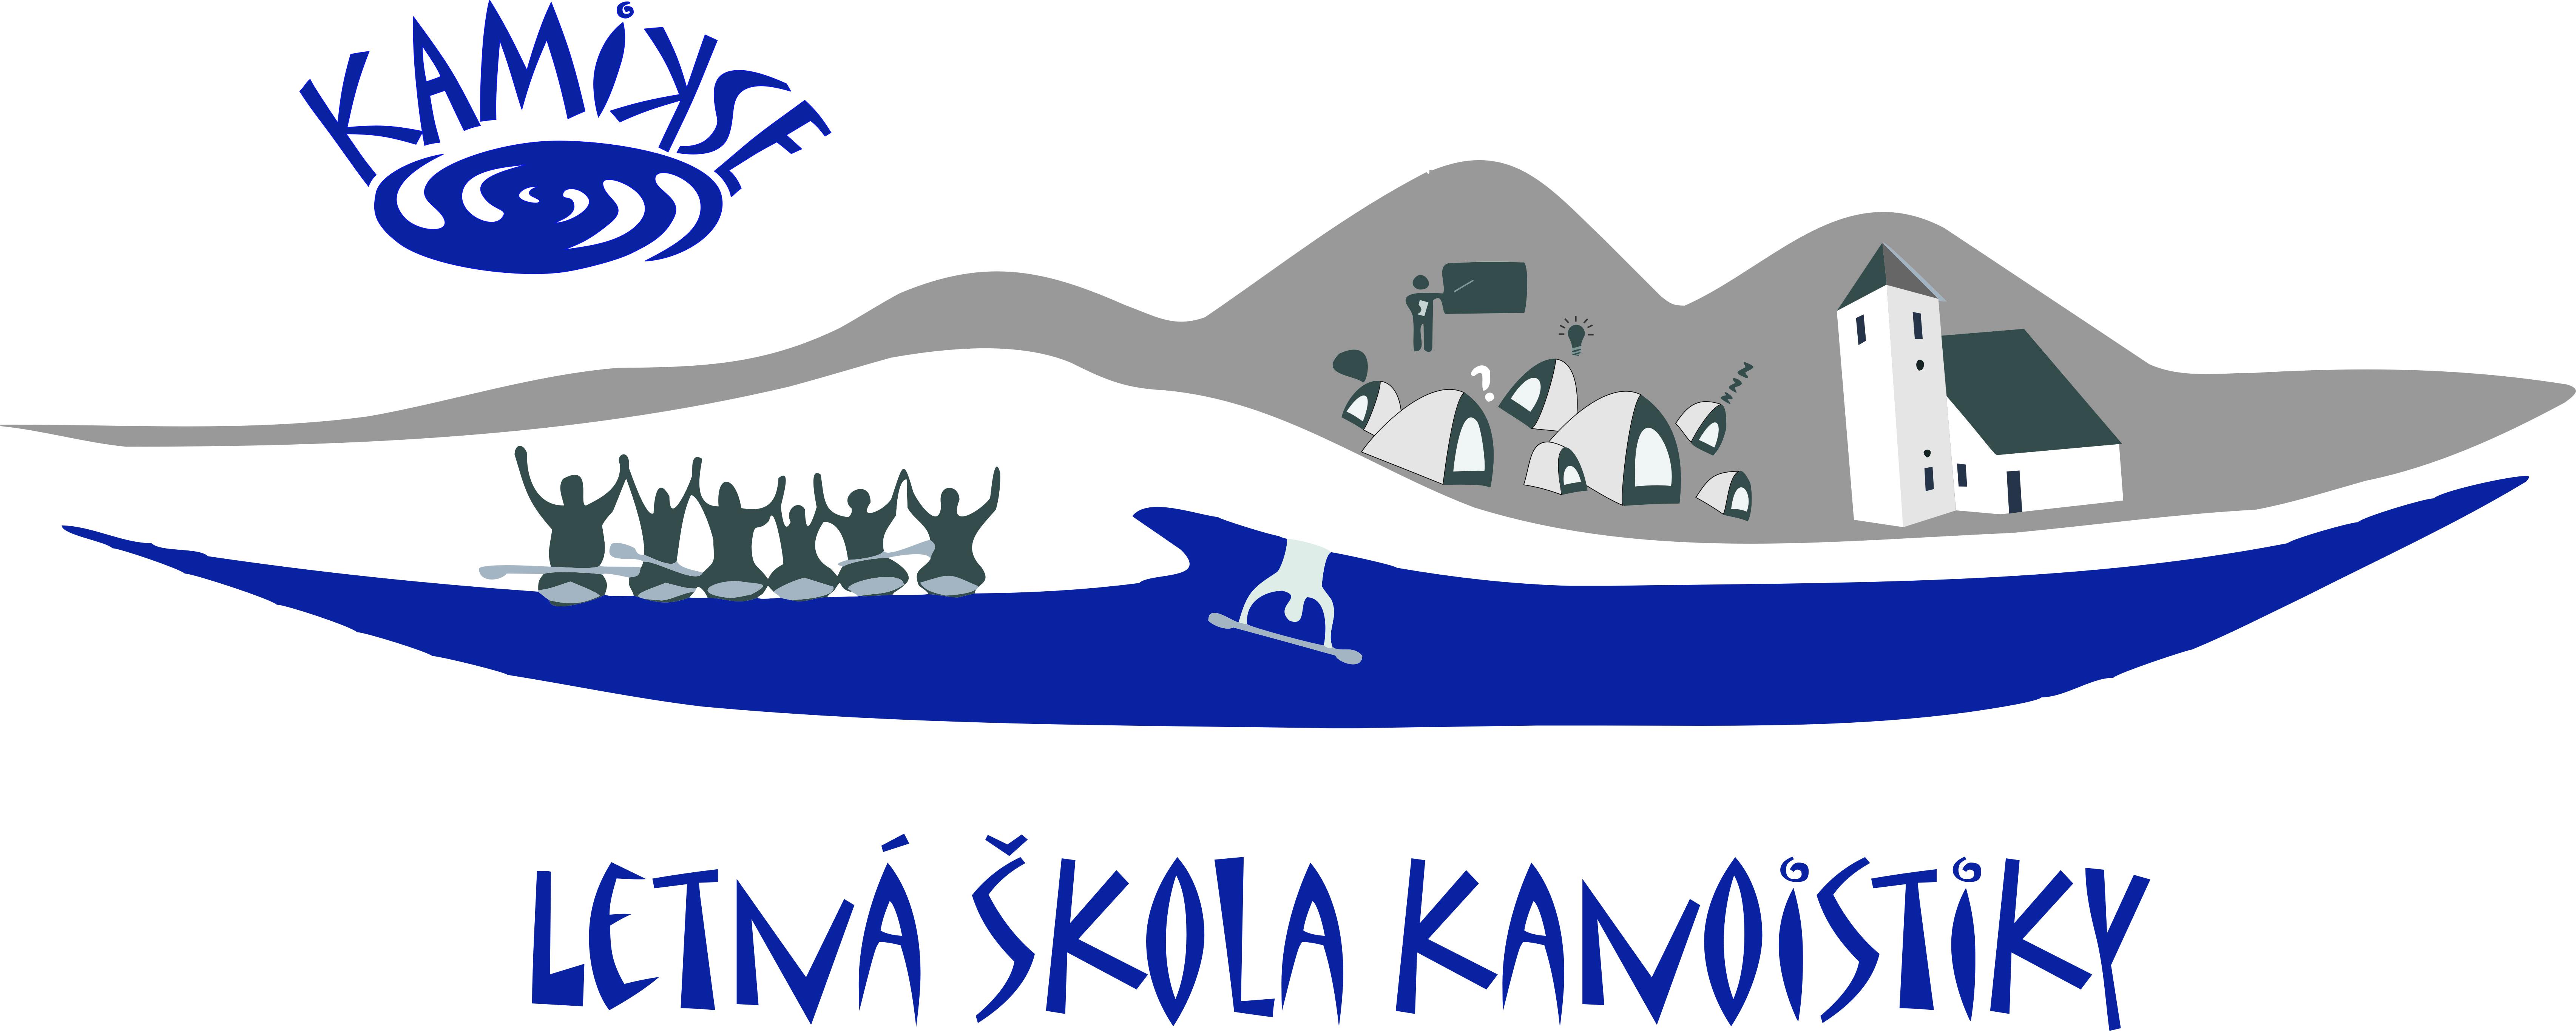 Kamikse letná škola kanoistiky 2015